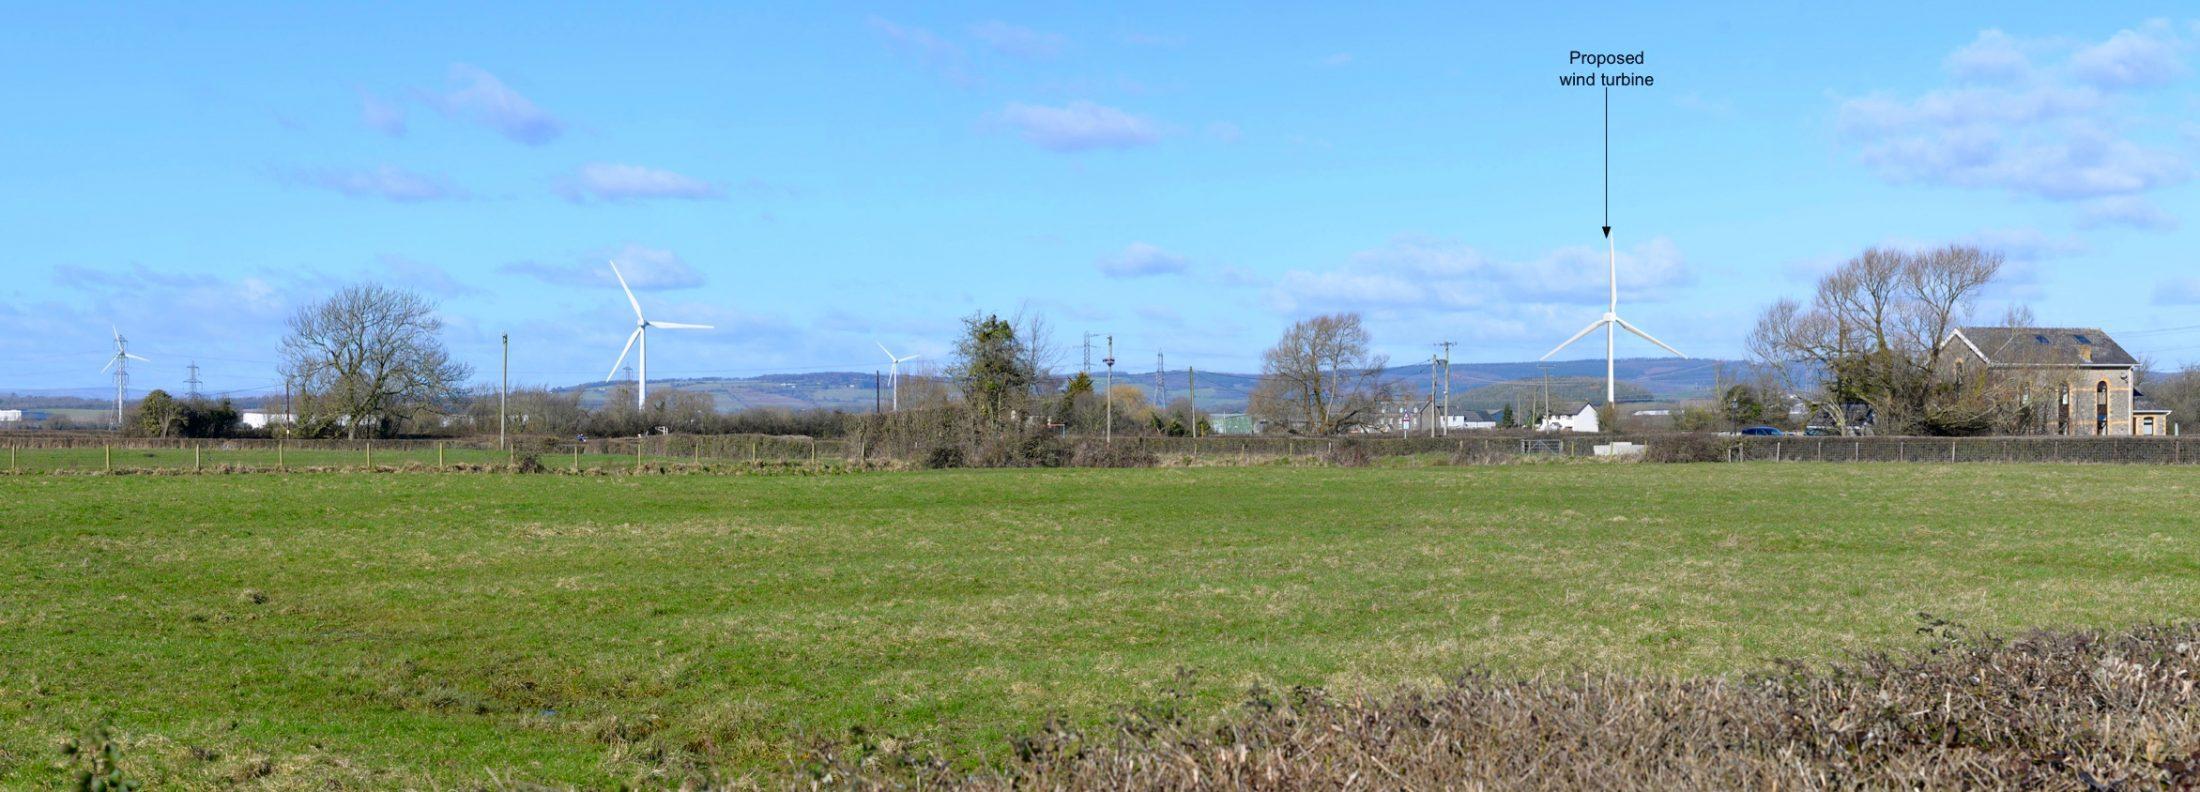 Rush Wall Lane wind turbine, Newport